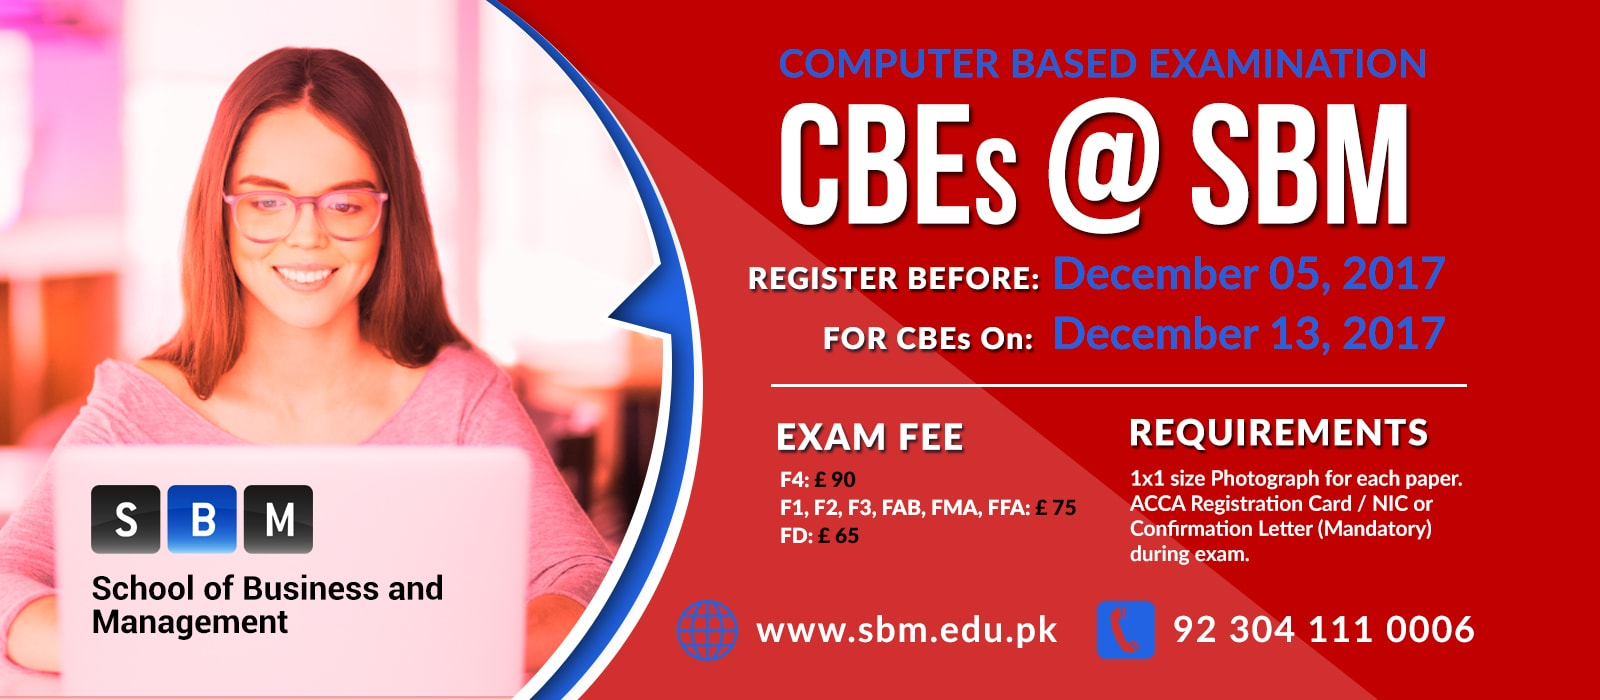 Register before 5th Dec for CBE exam on 13th Dec, 2017